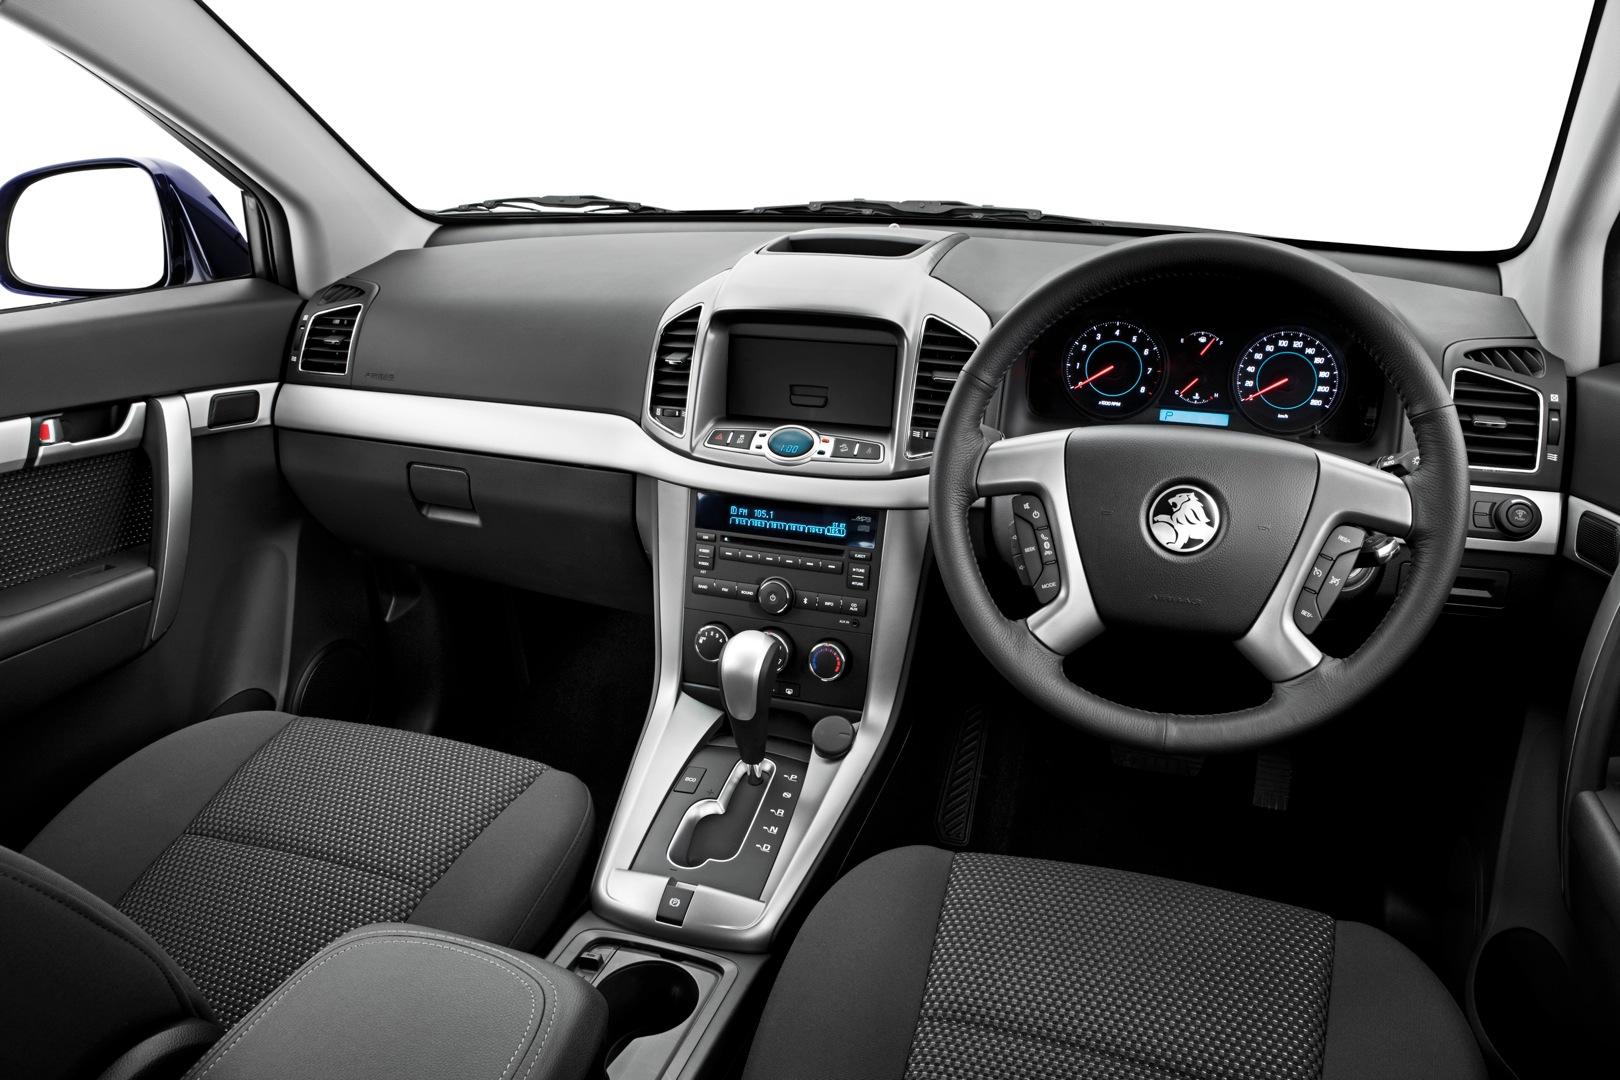 holden captiva specs 2011 2012 2013 2014 2015 2016 2017 rh autoevolution com 2014 Captiva LTZ Holden Commodore SS V8